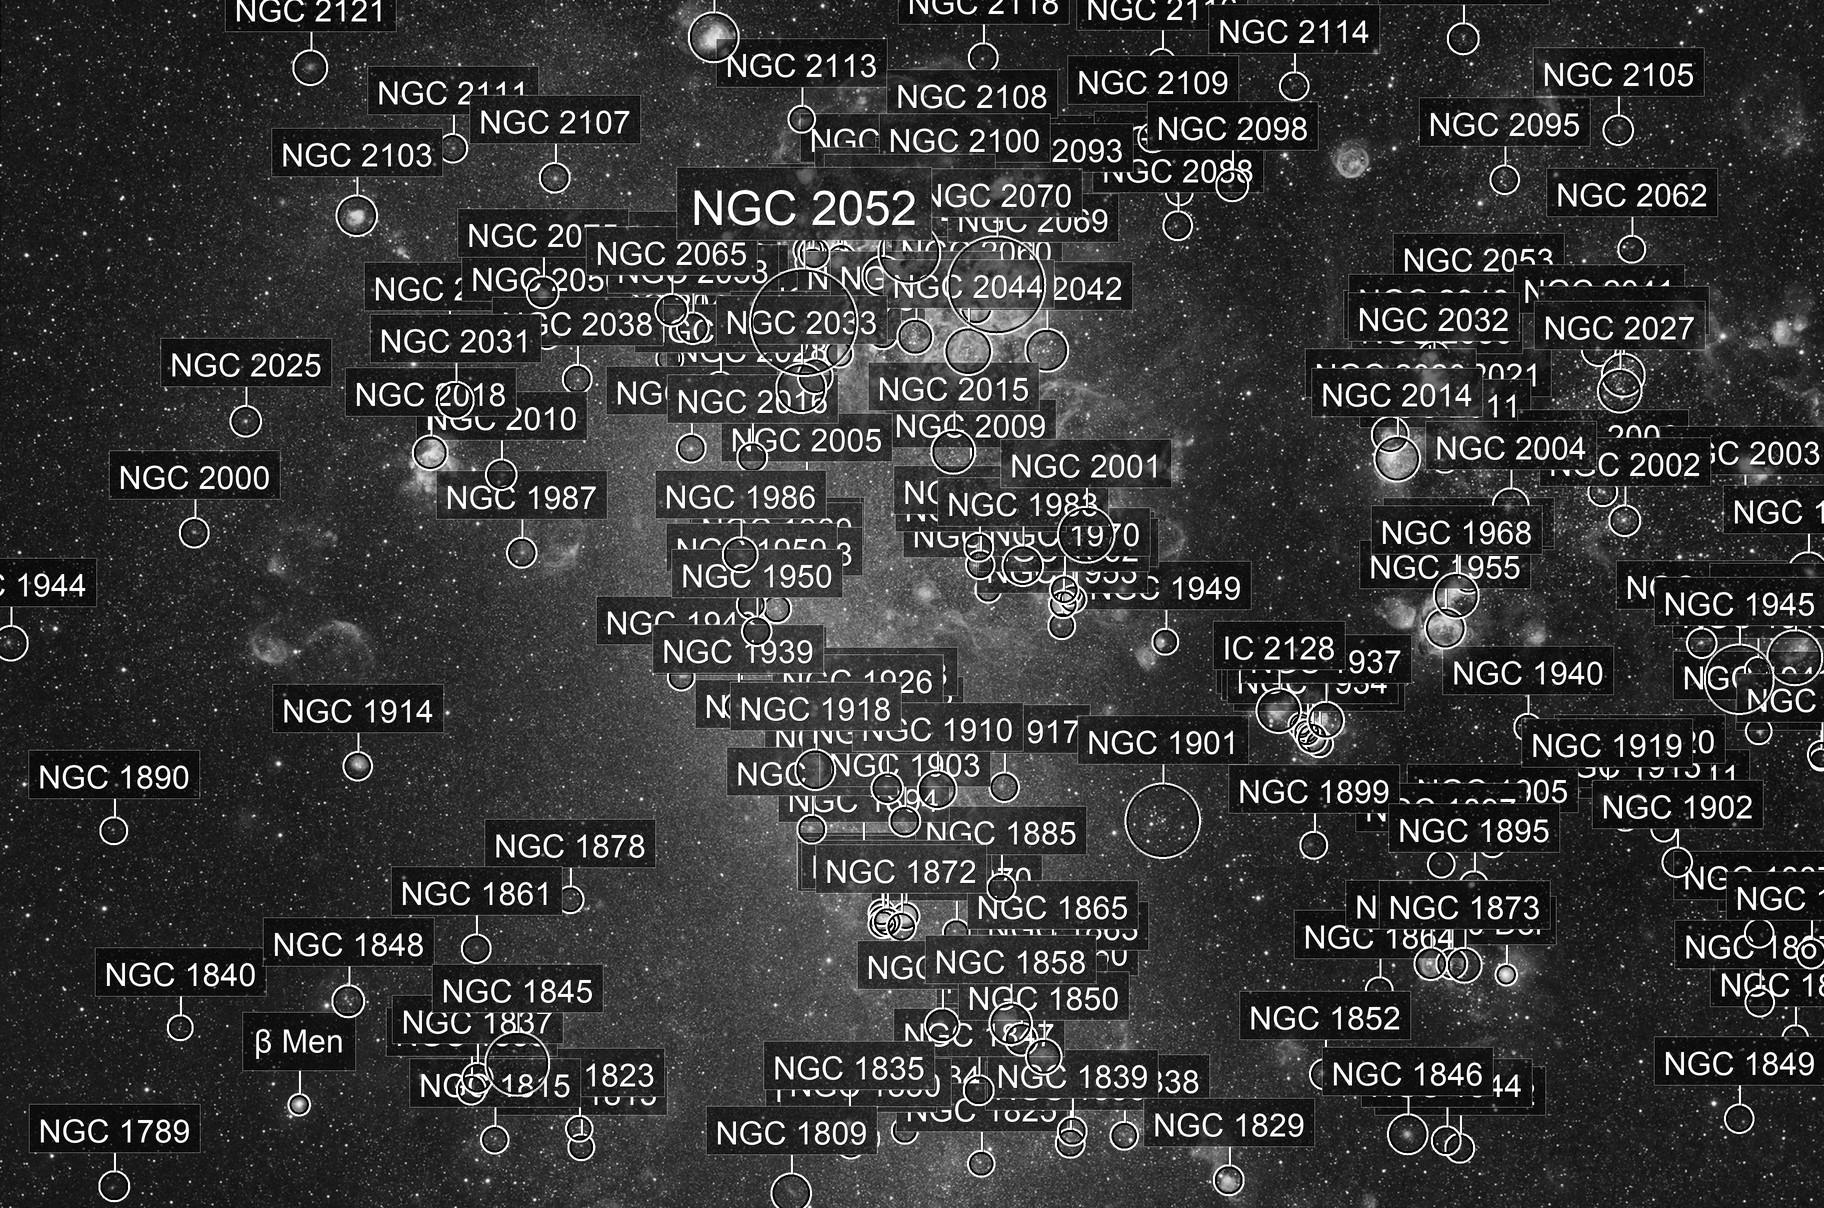 Large Magellanic Cloud & Tarentula nebulae